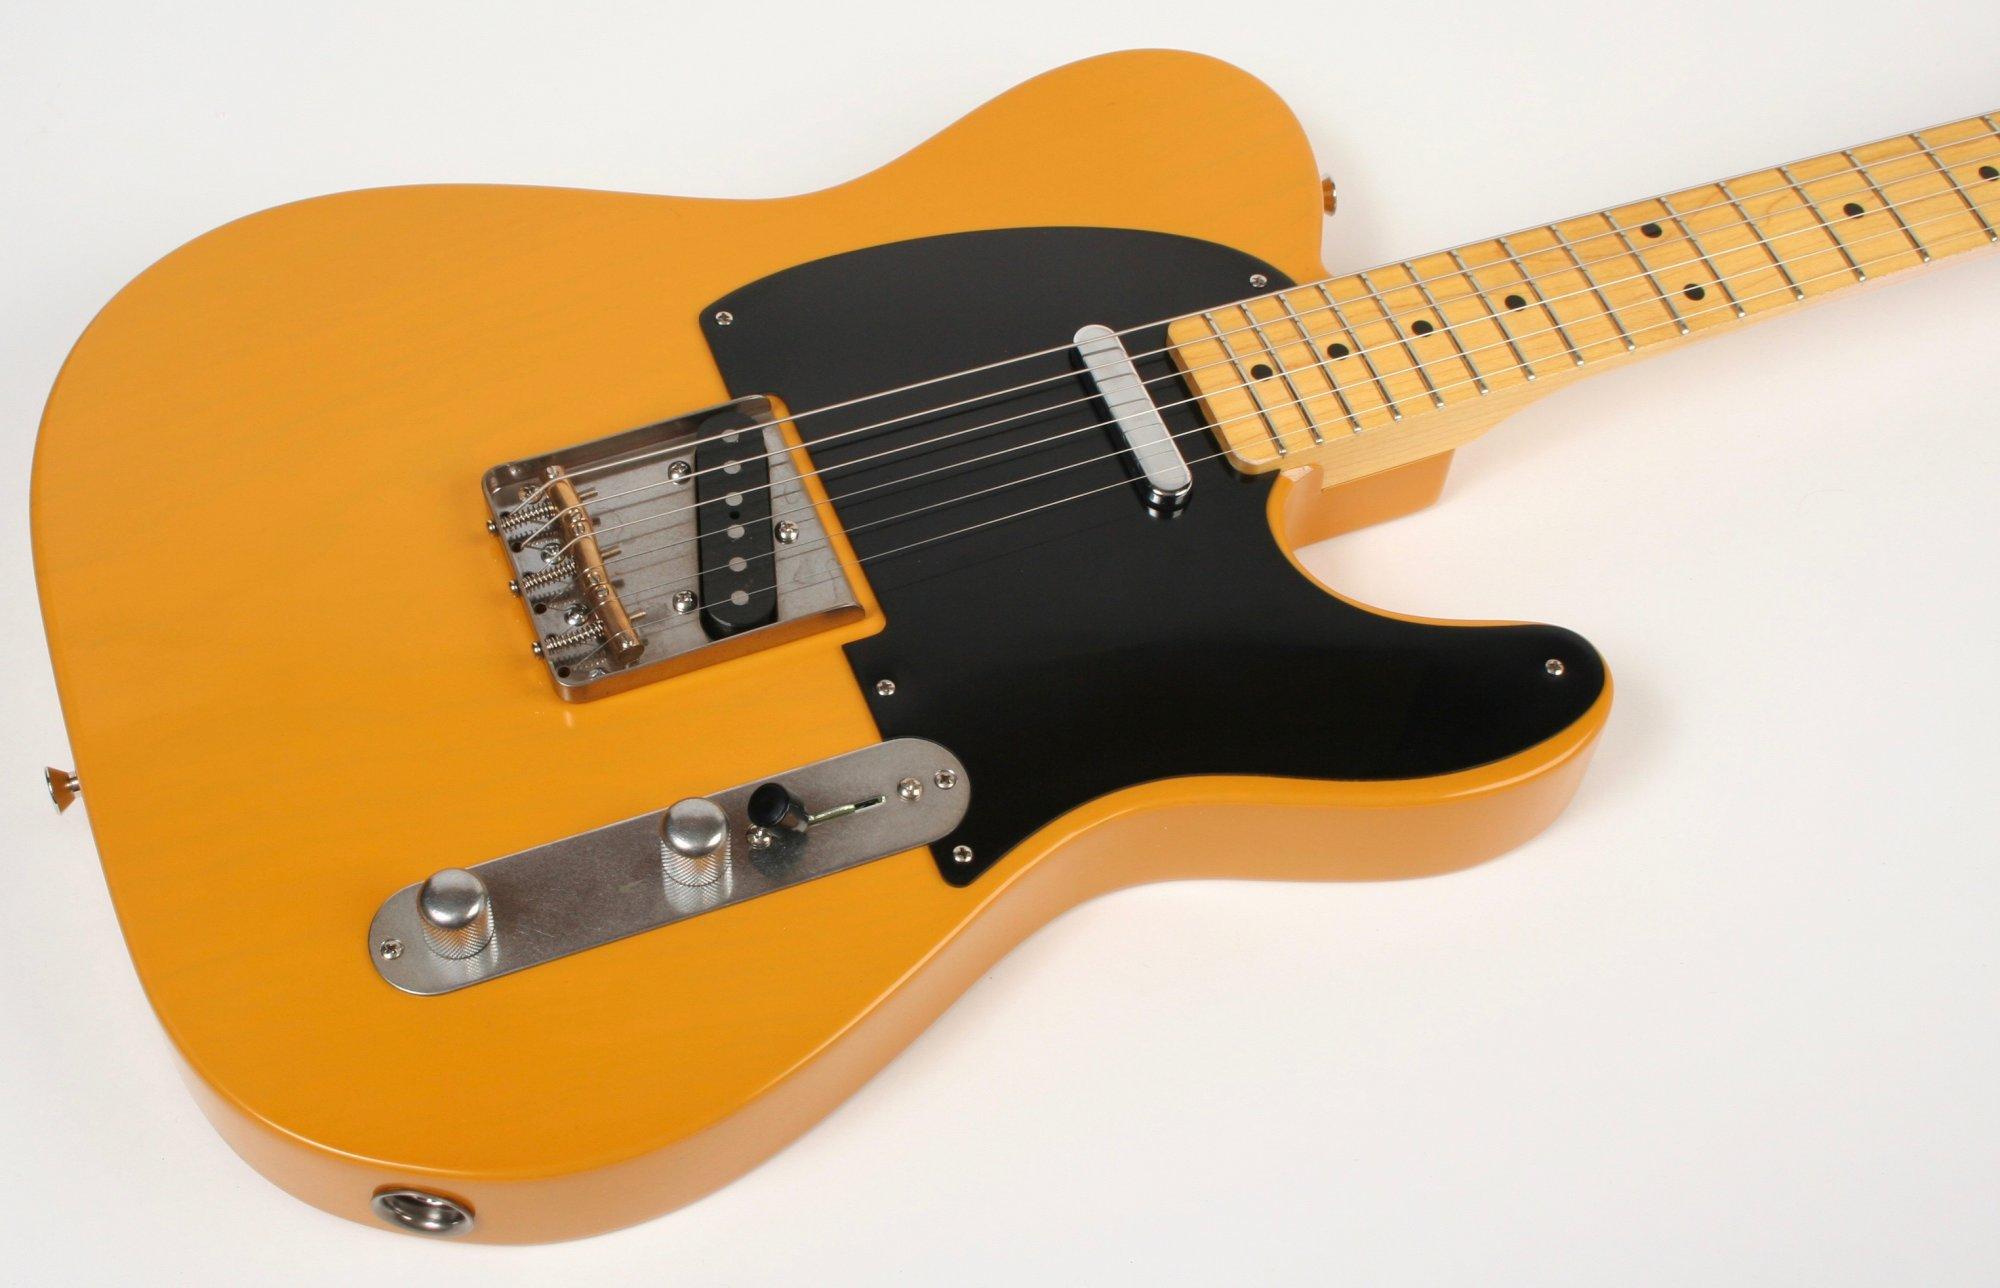 Nash Guitars T-52 Butterscotch Blonde Extra Light Aging